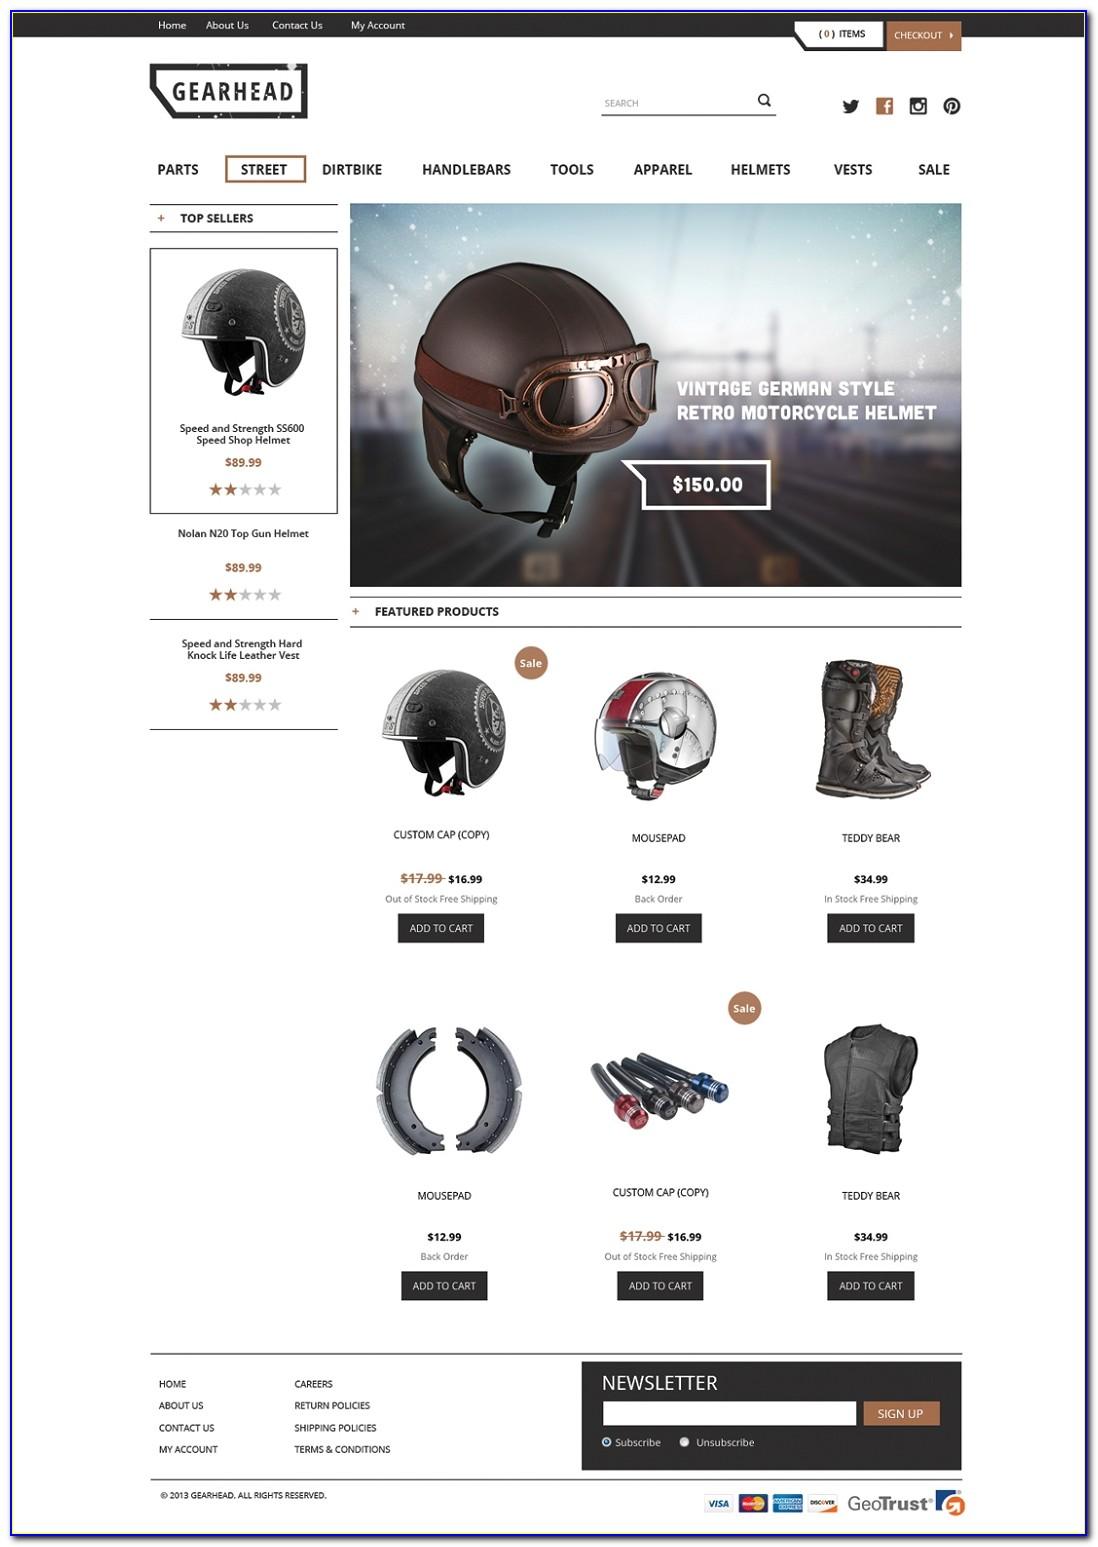 3dcart Premium Themes